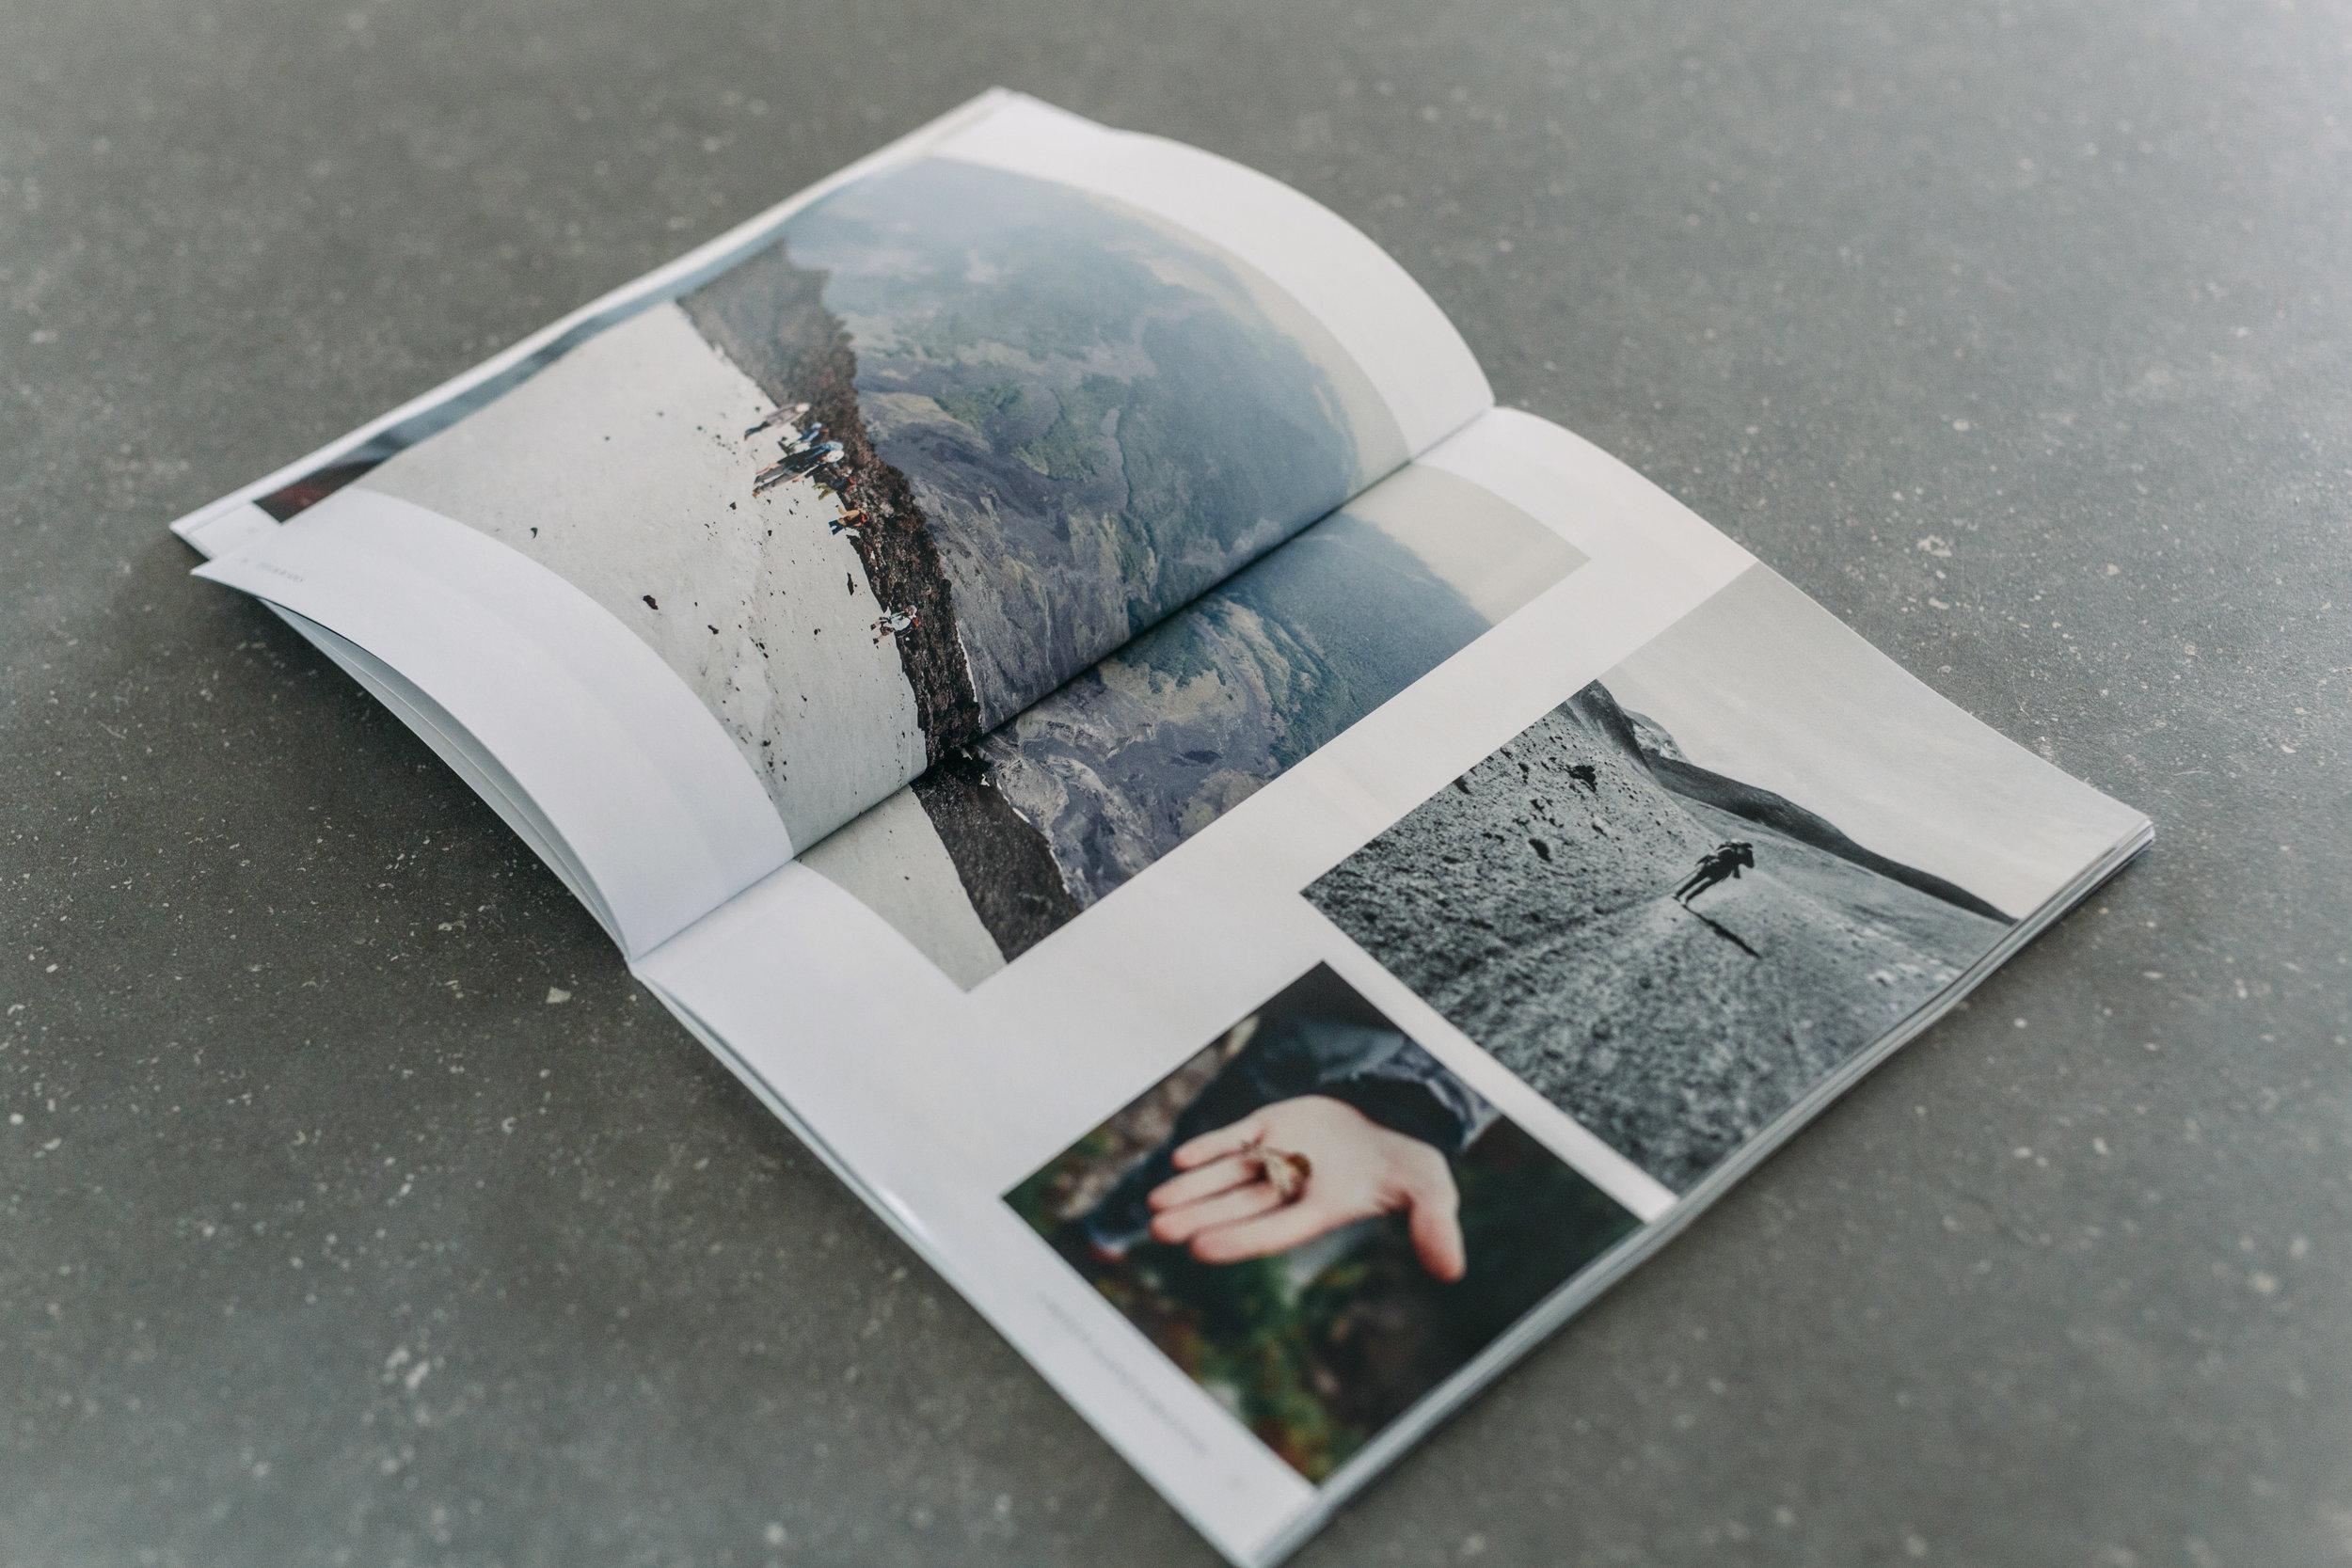 Promo-Books-Photos-TaylorRoades-0033.JPG